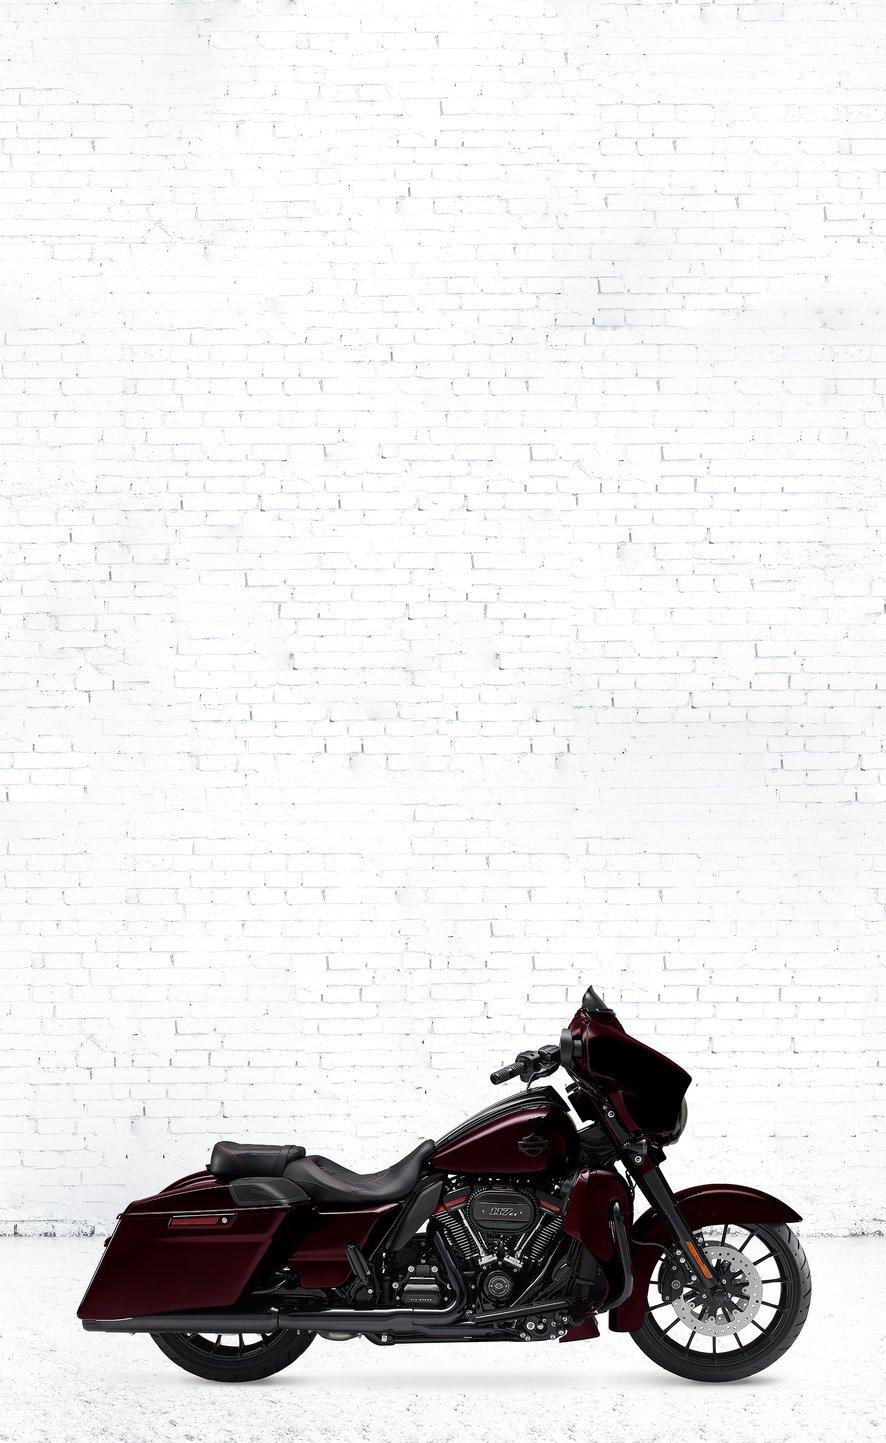 dcb60130921 Scroll left 2019 Harley-Davidson CVO Street Glide motorcycle